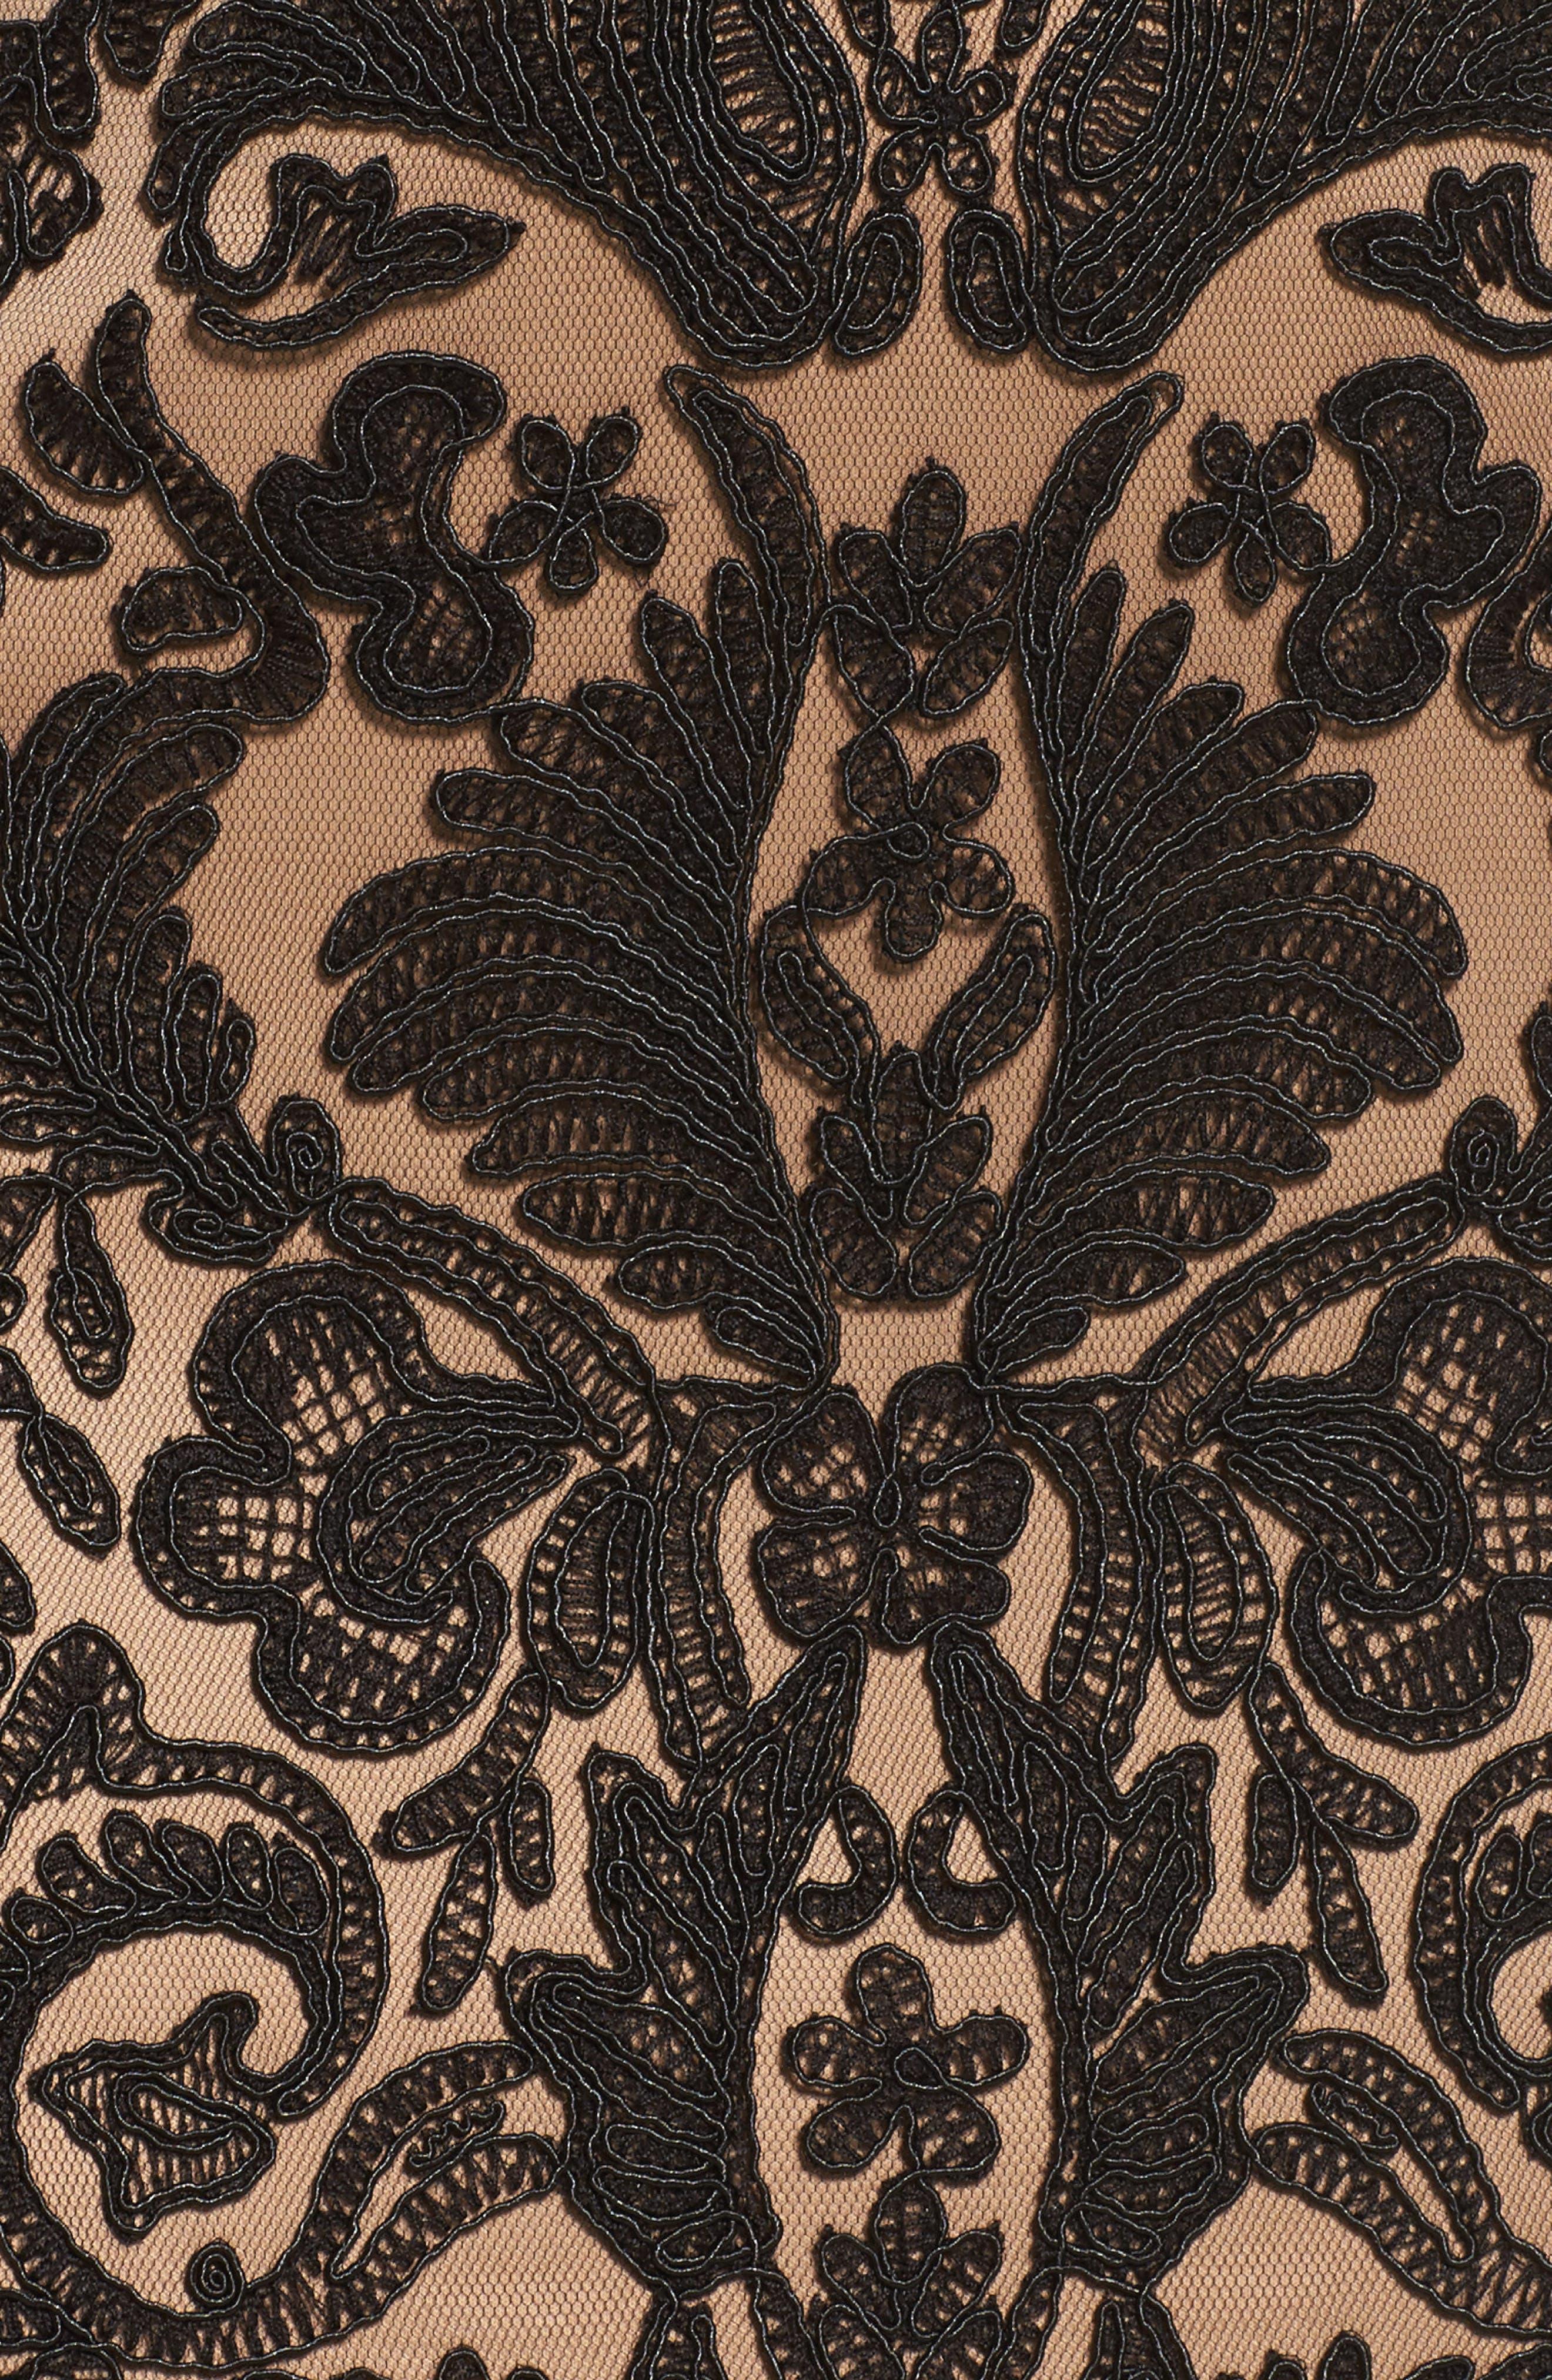 Illusion Yoke Gown,                             Alternate thumbnail 5, color,                             Black/ Nude